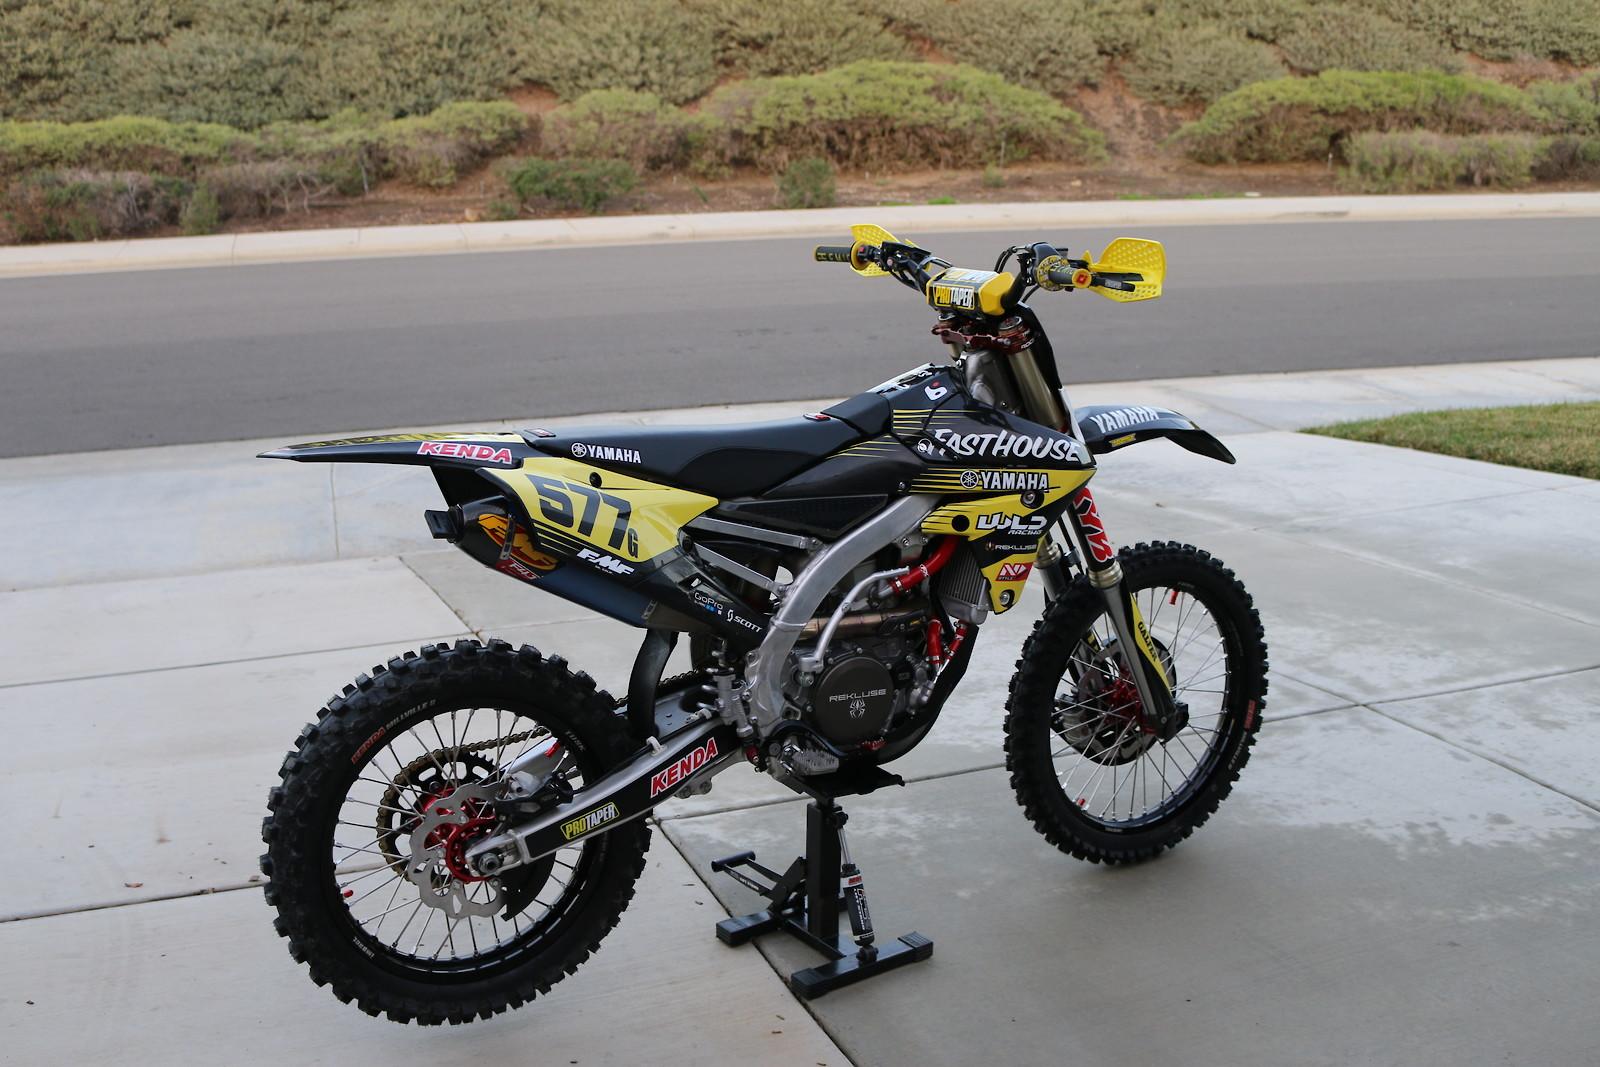 IMG 5899 - WLD - Motocross Pictures - Vital MX